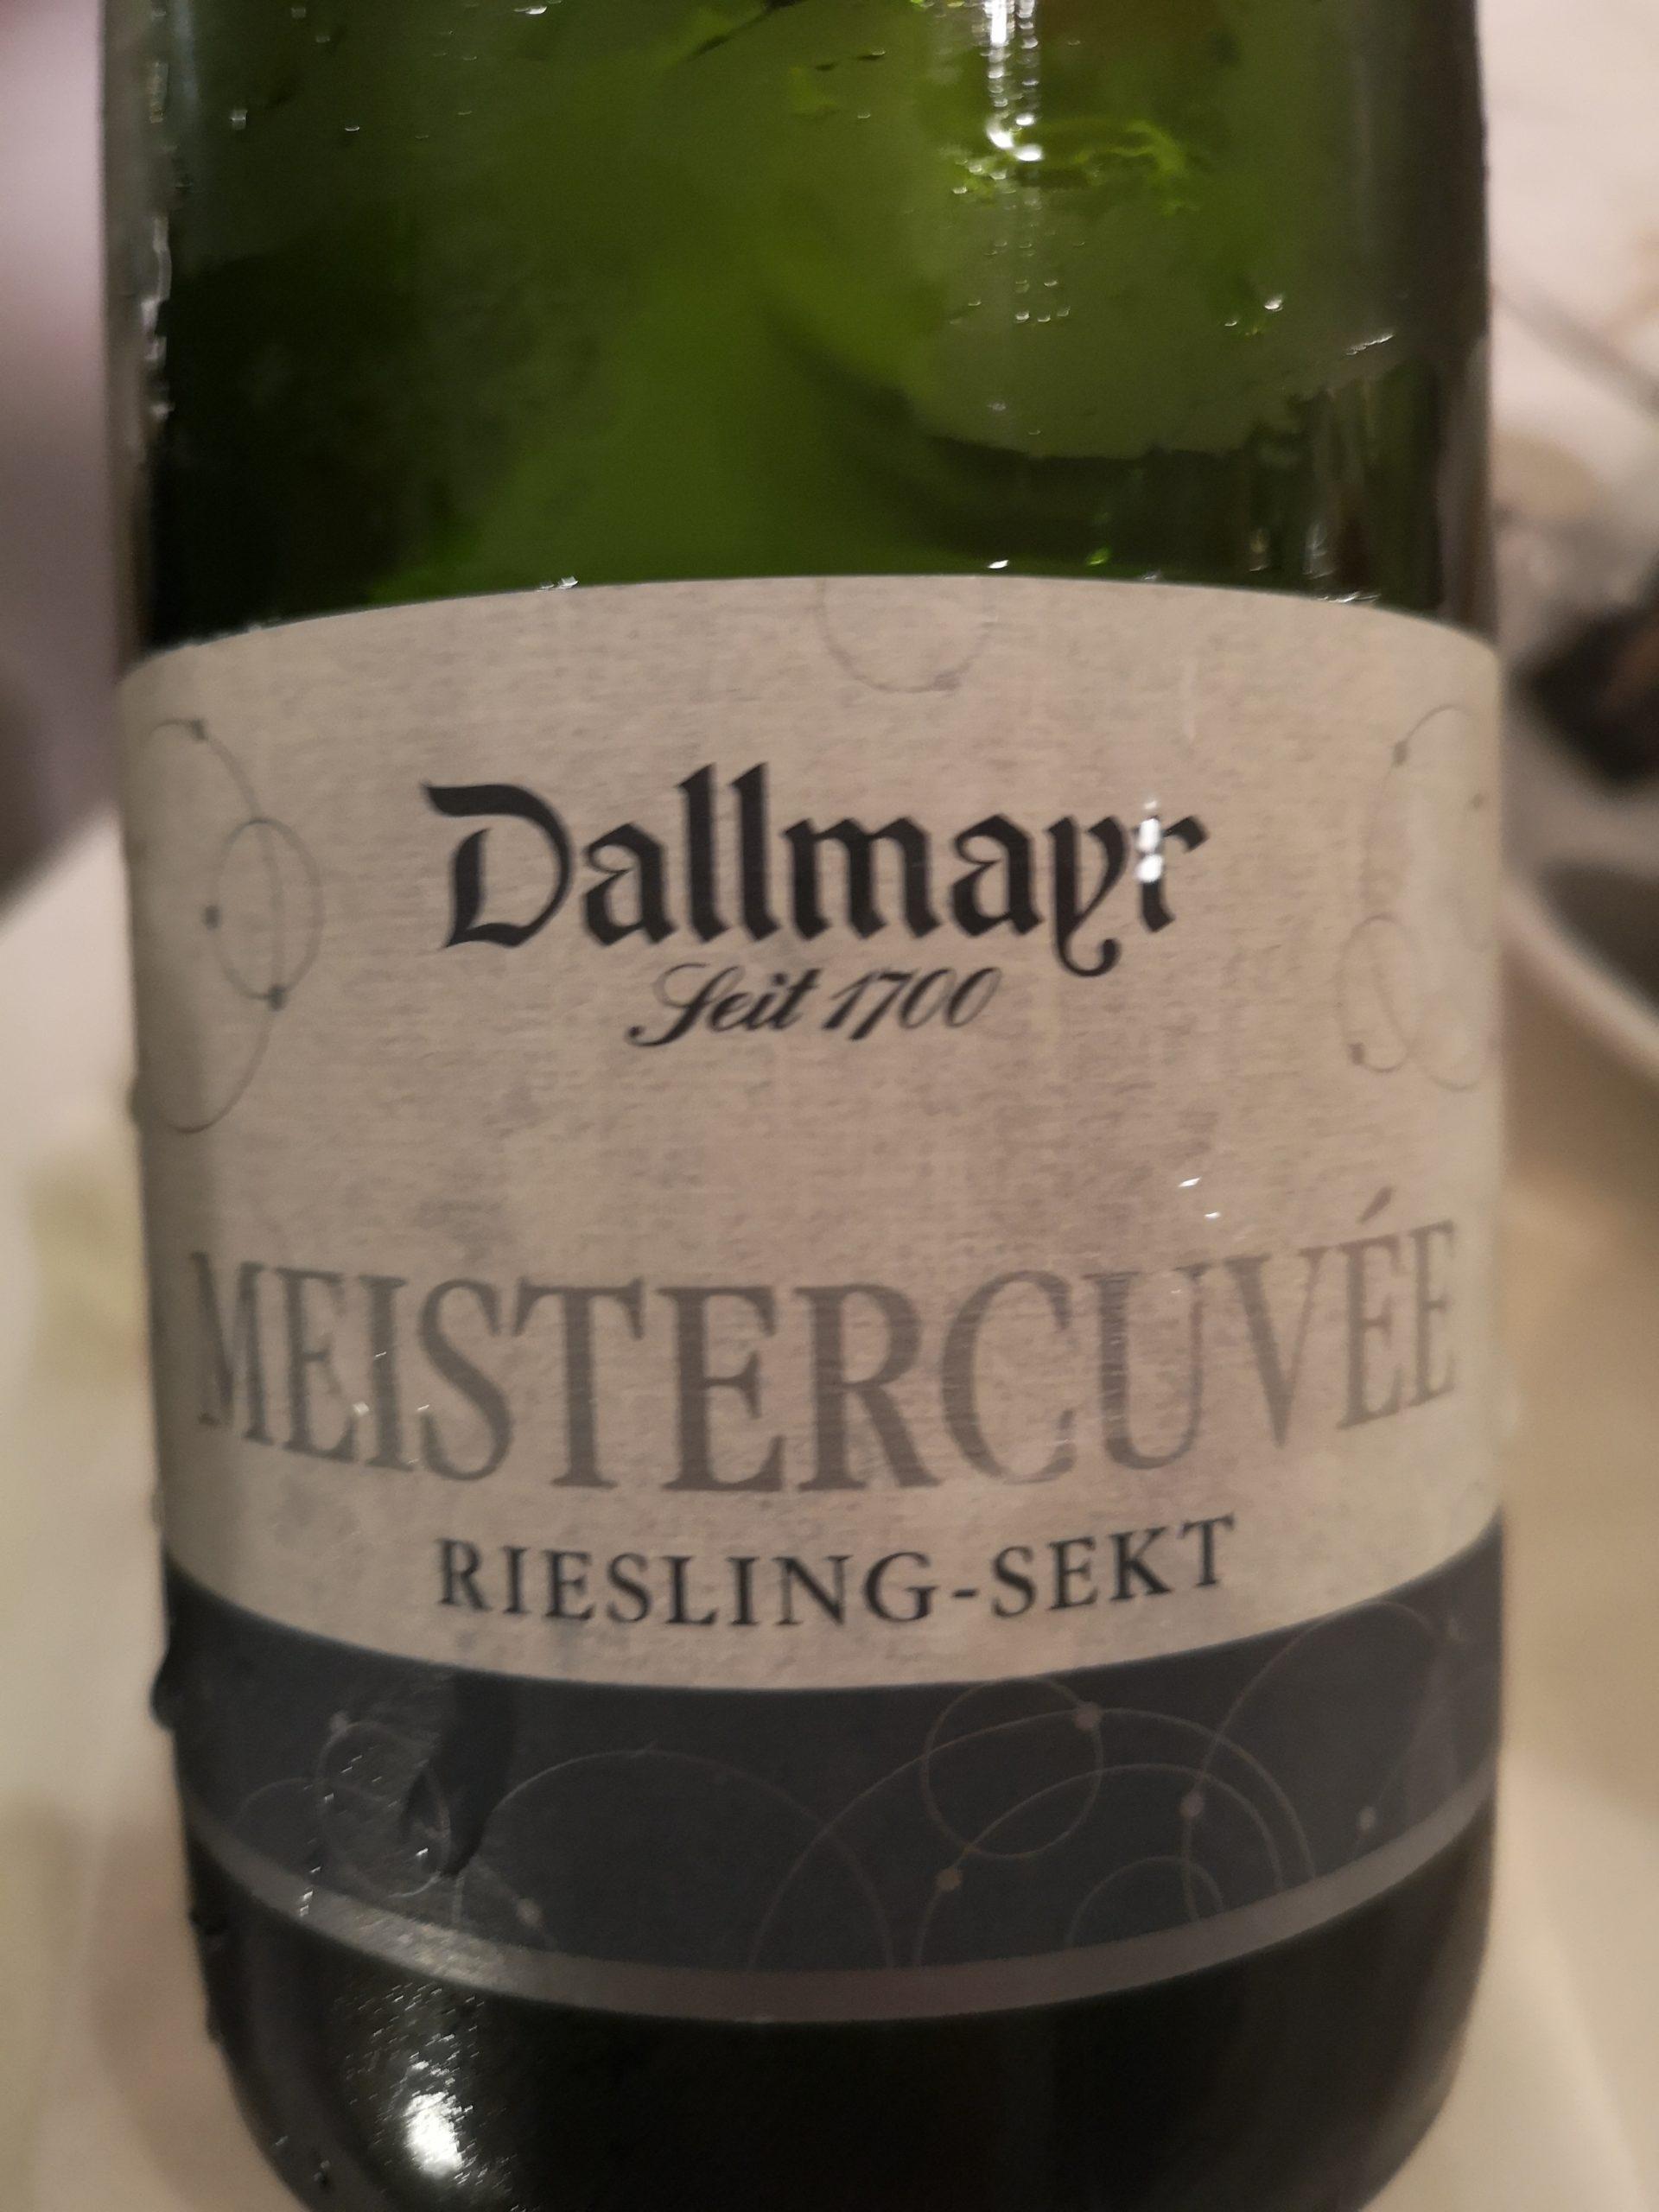 2017 Riesling Sekt Meistercuvée extra trocken | Dallmayr